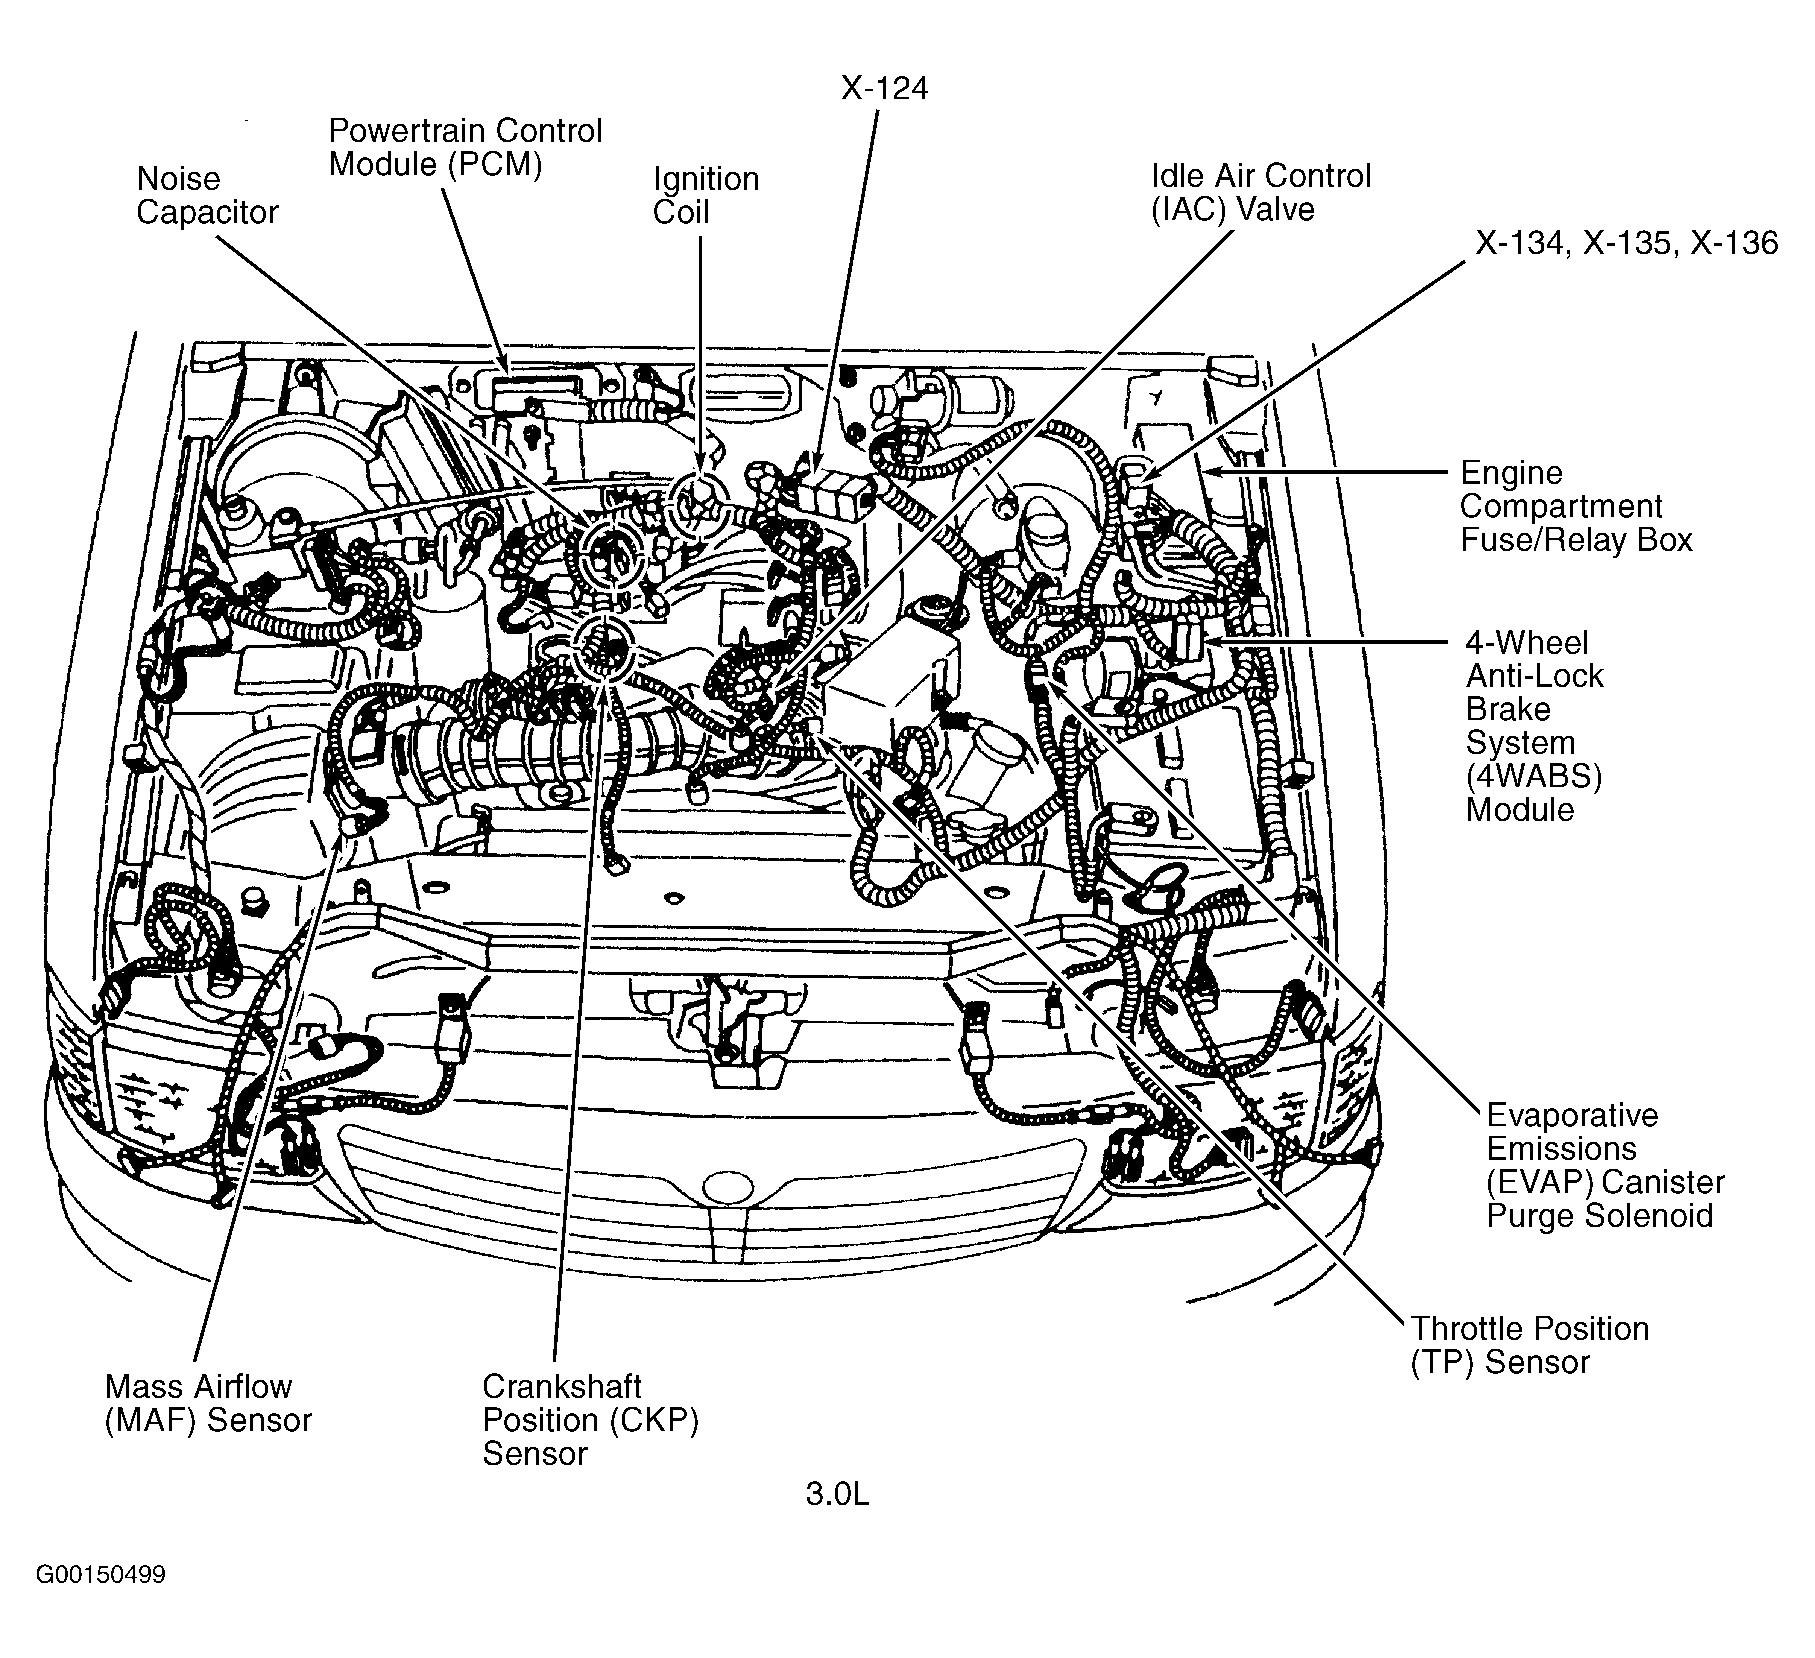 1996 ford Explorer Parts Diagram 96 Explorer Fuse Diagram Of 1996 ford Explorer Parts Diagram